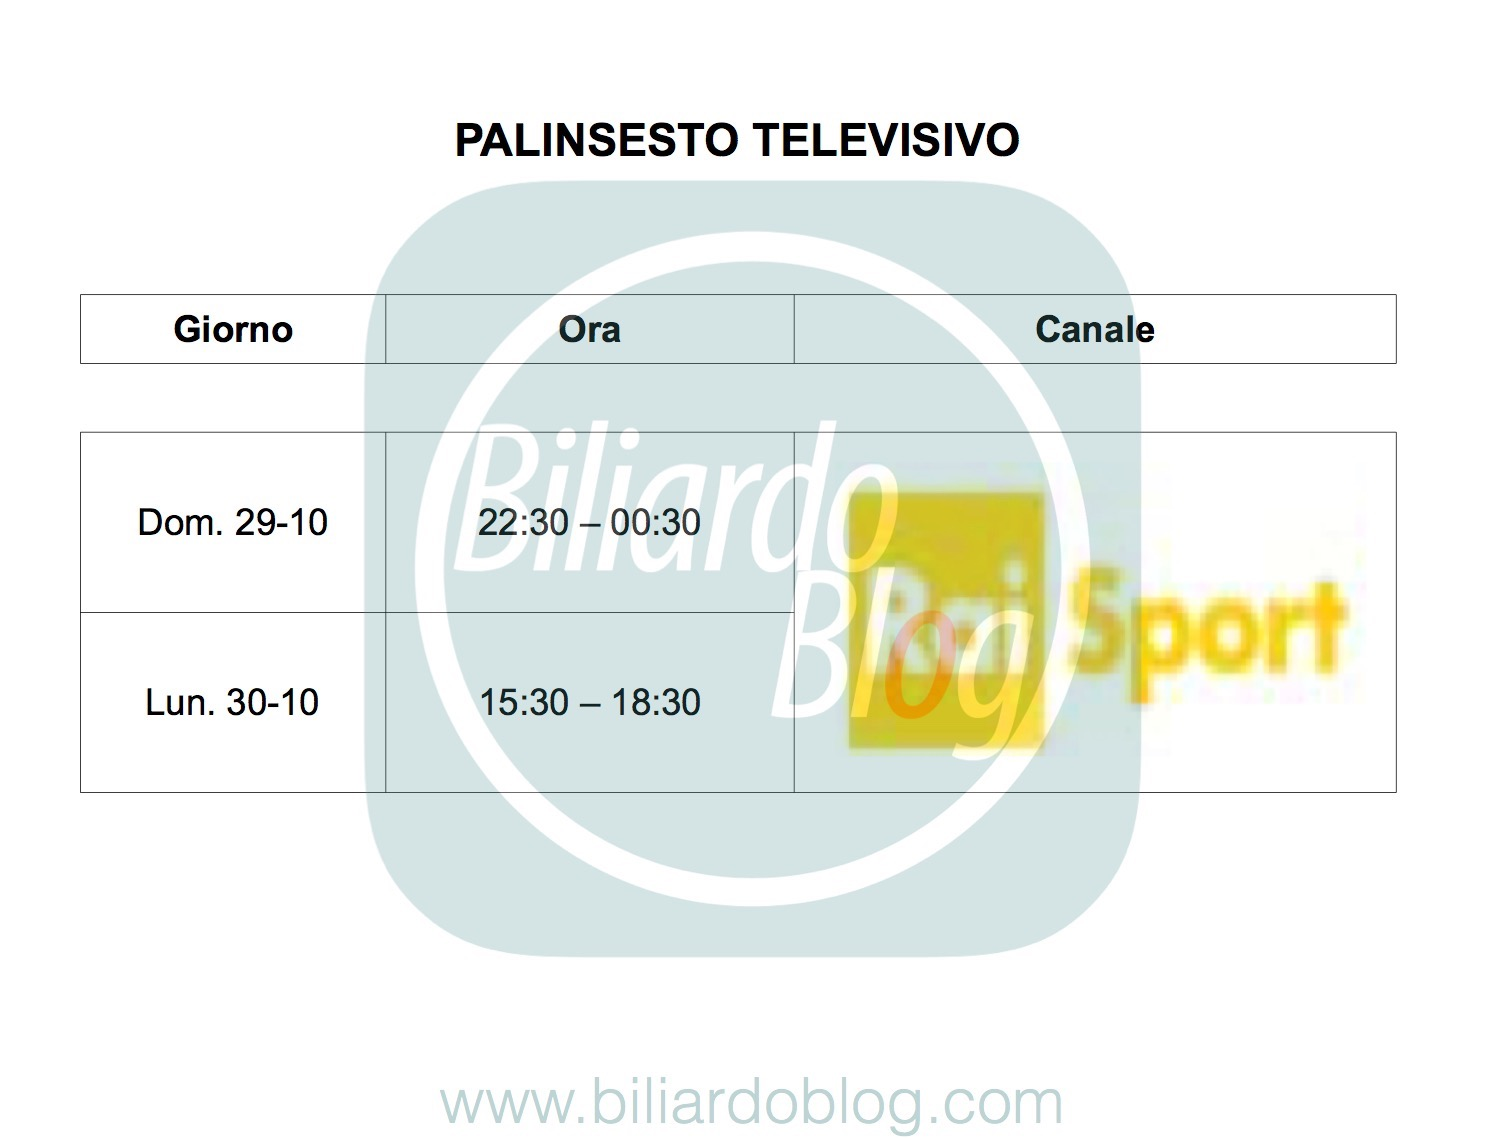 Campionato BTP di Biliardo 2017 2018: palinsesto Rai